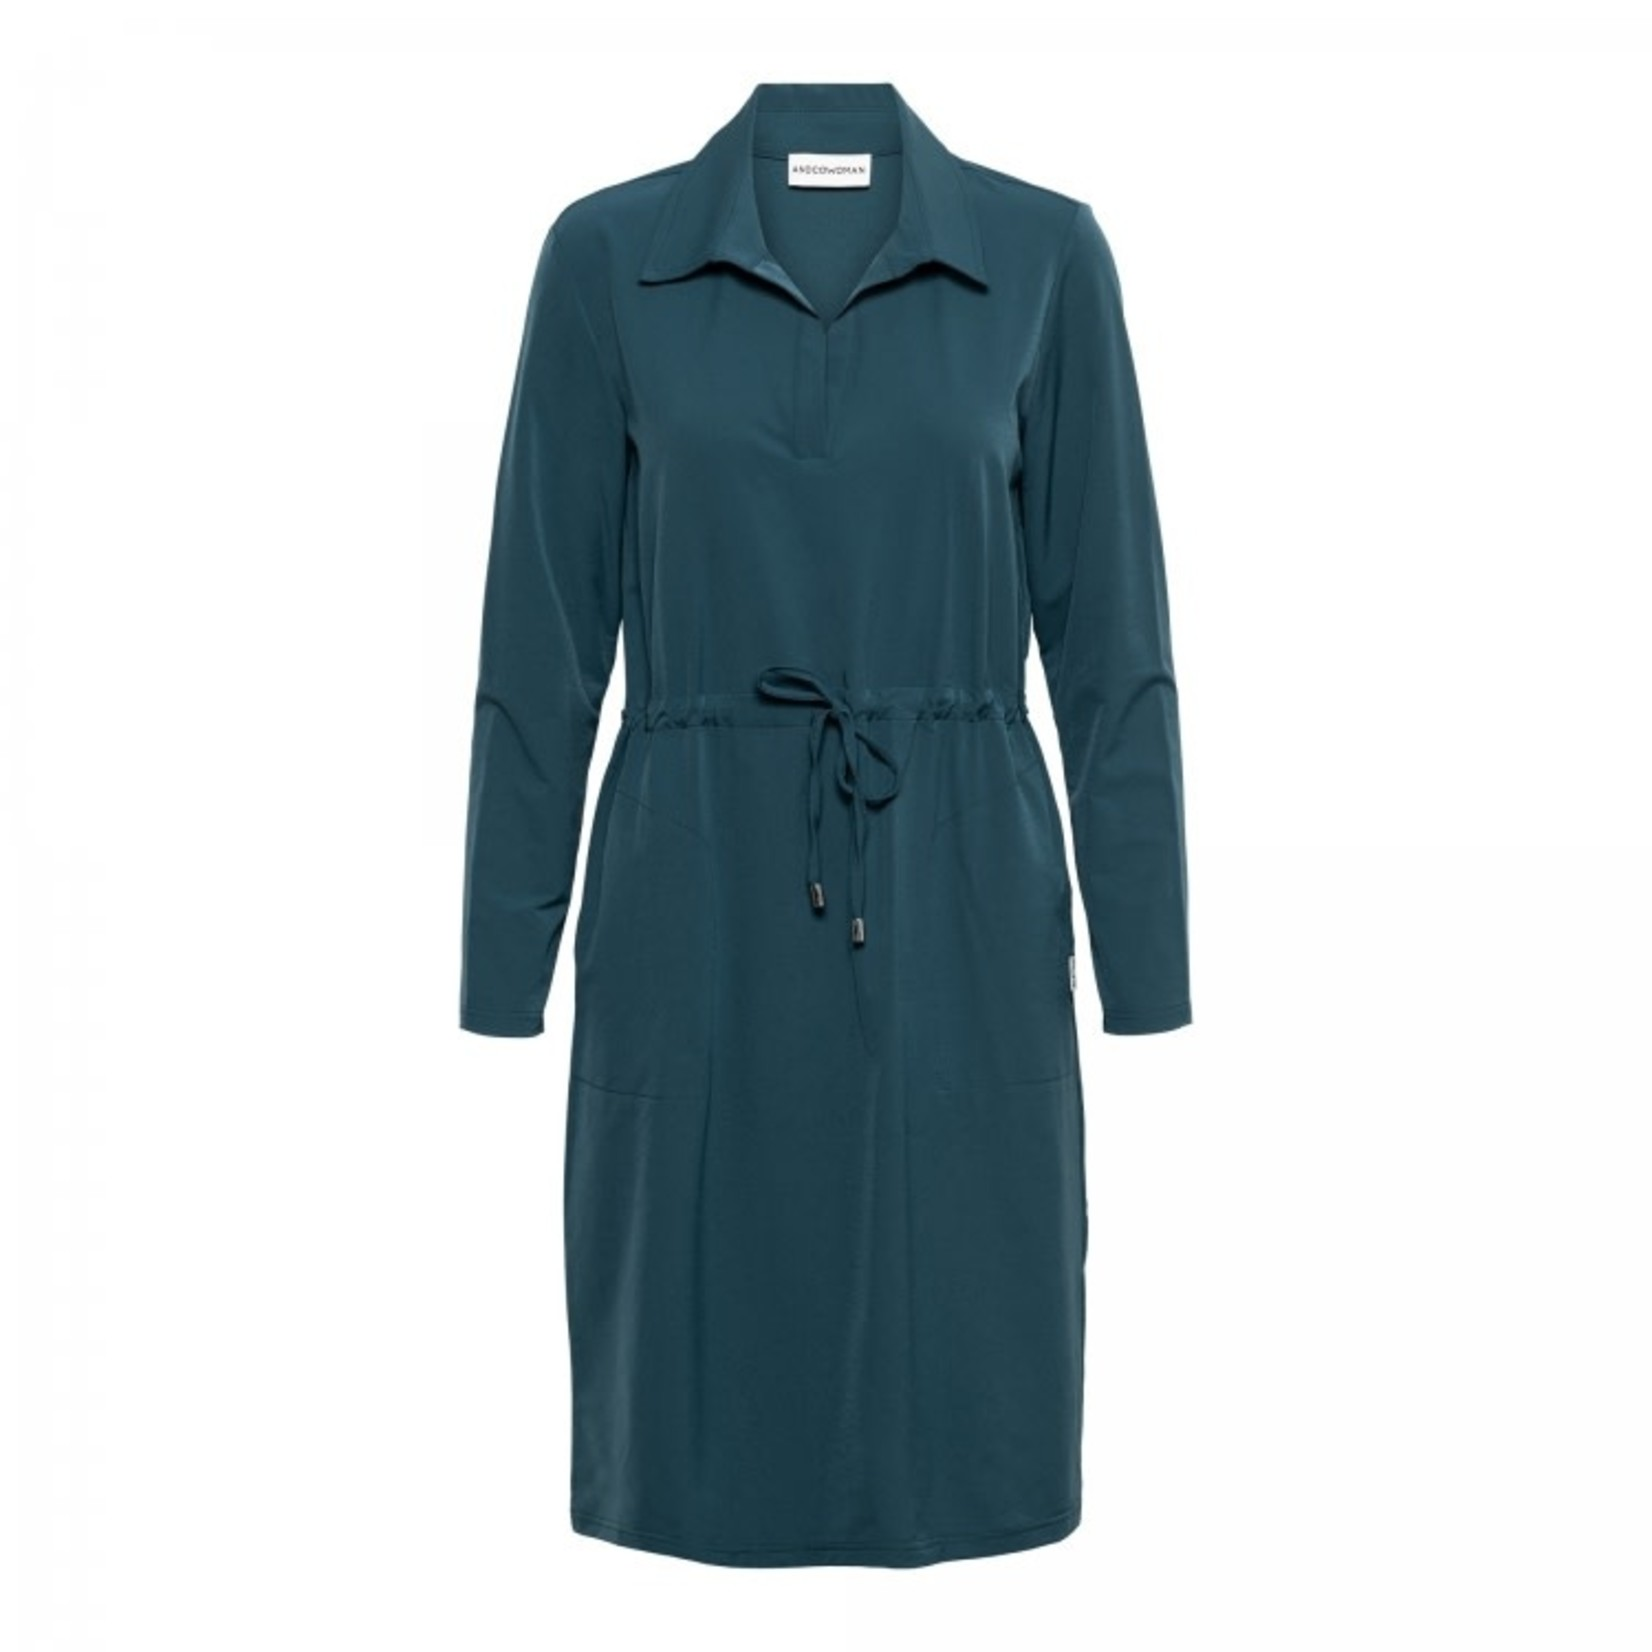 & Co & CO Woman Pearl Dress Pine Green